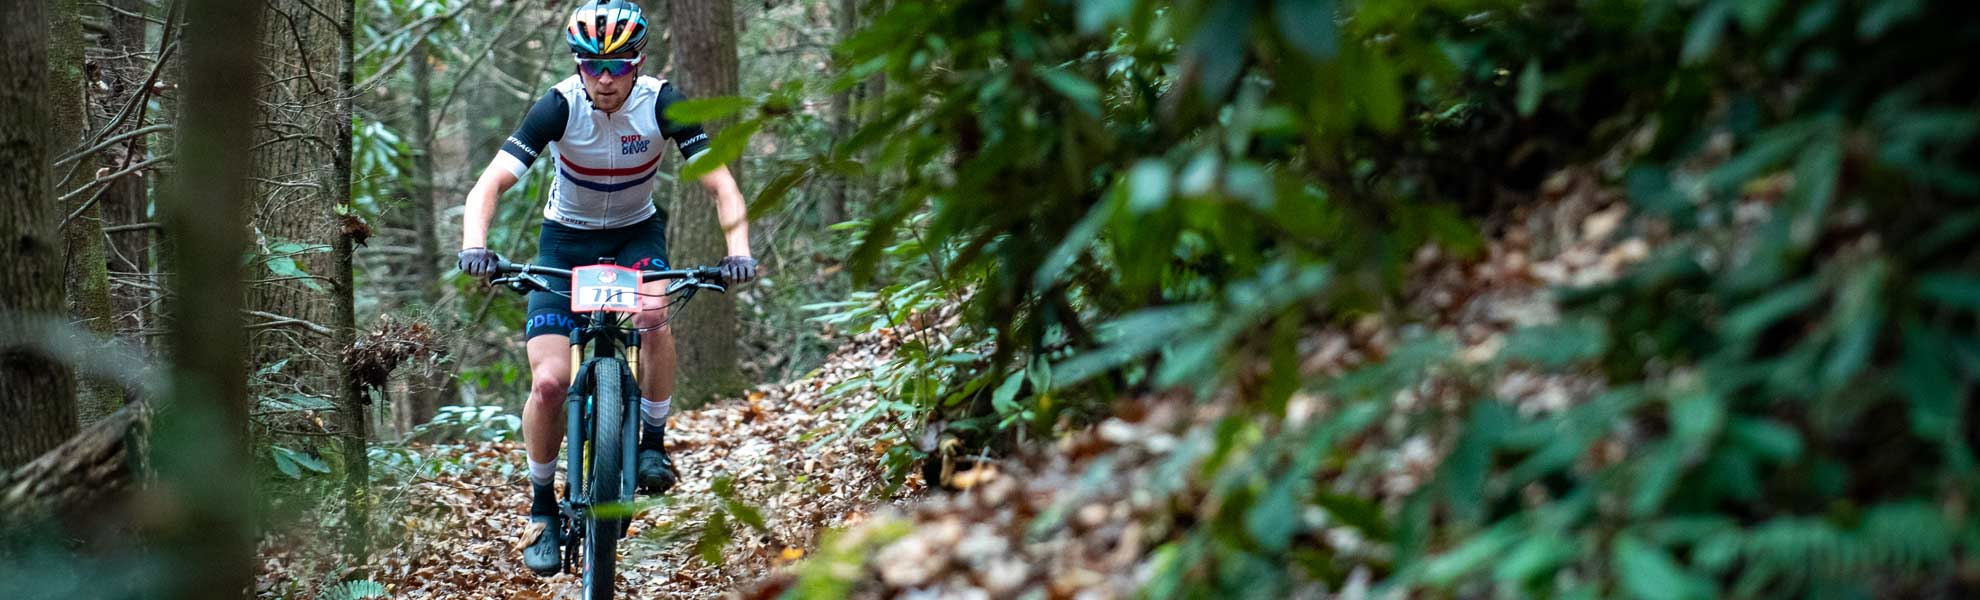 mountain biker racing on single track